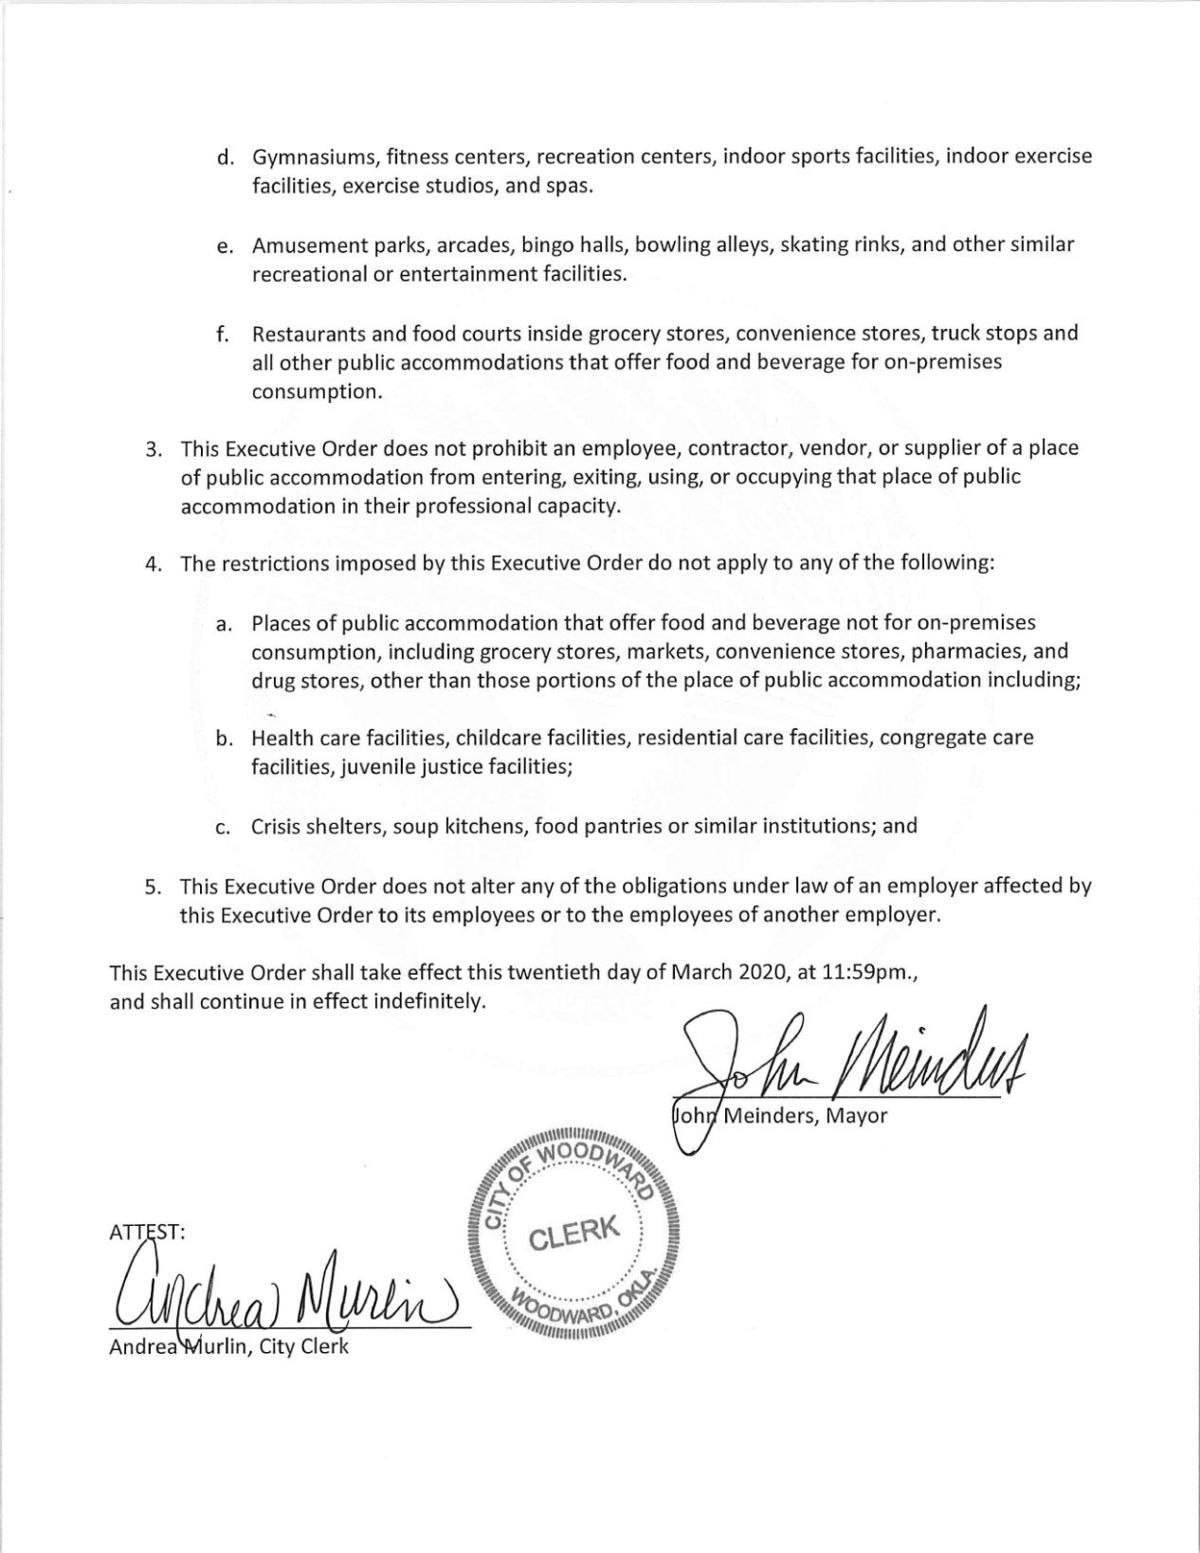 New proclamation 2